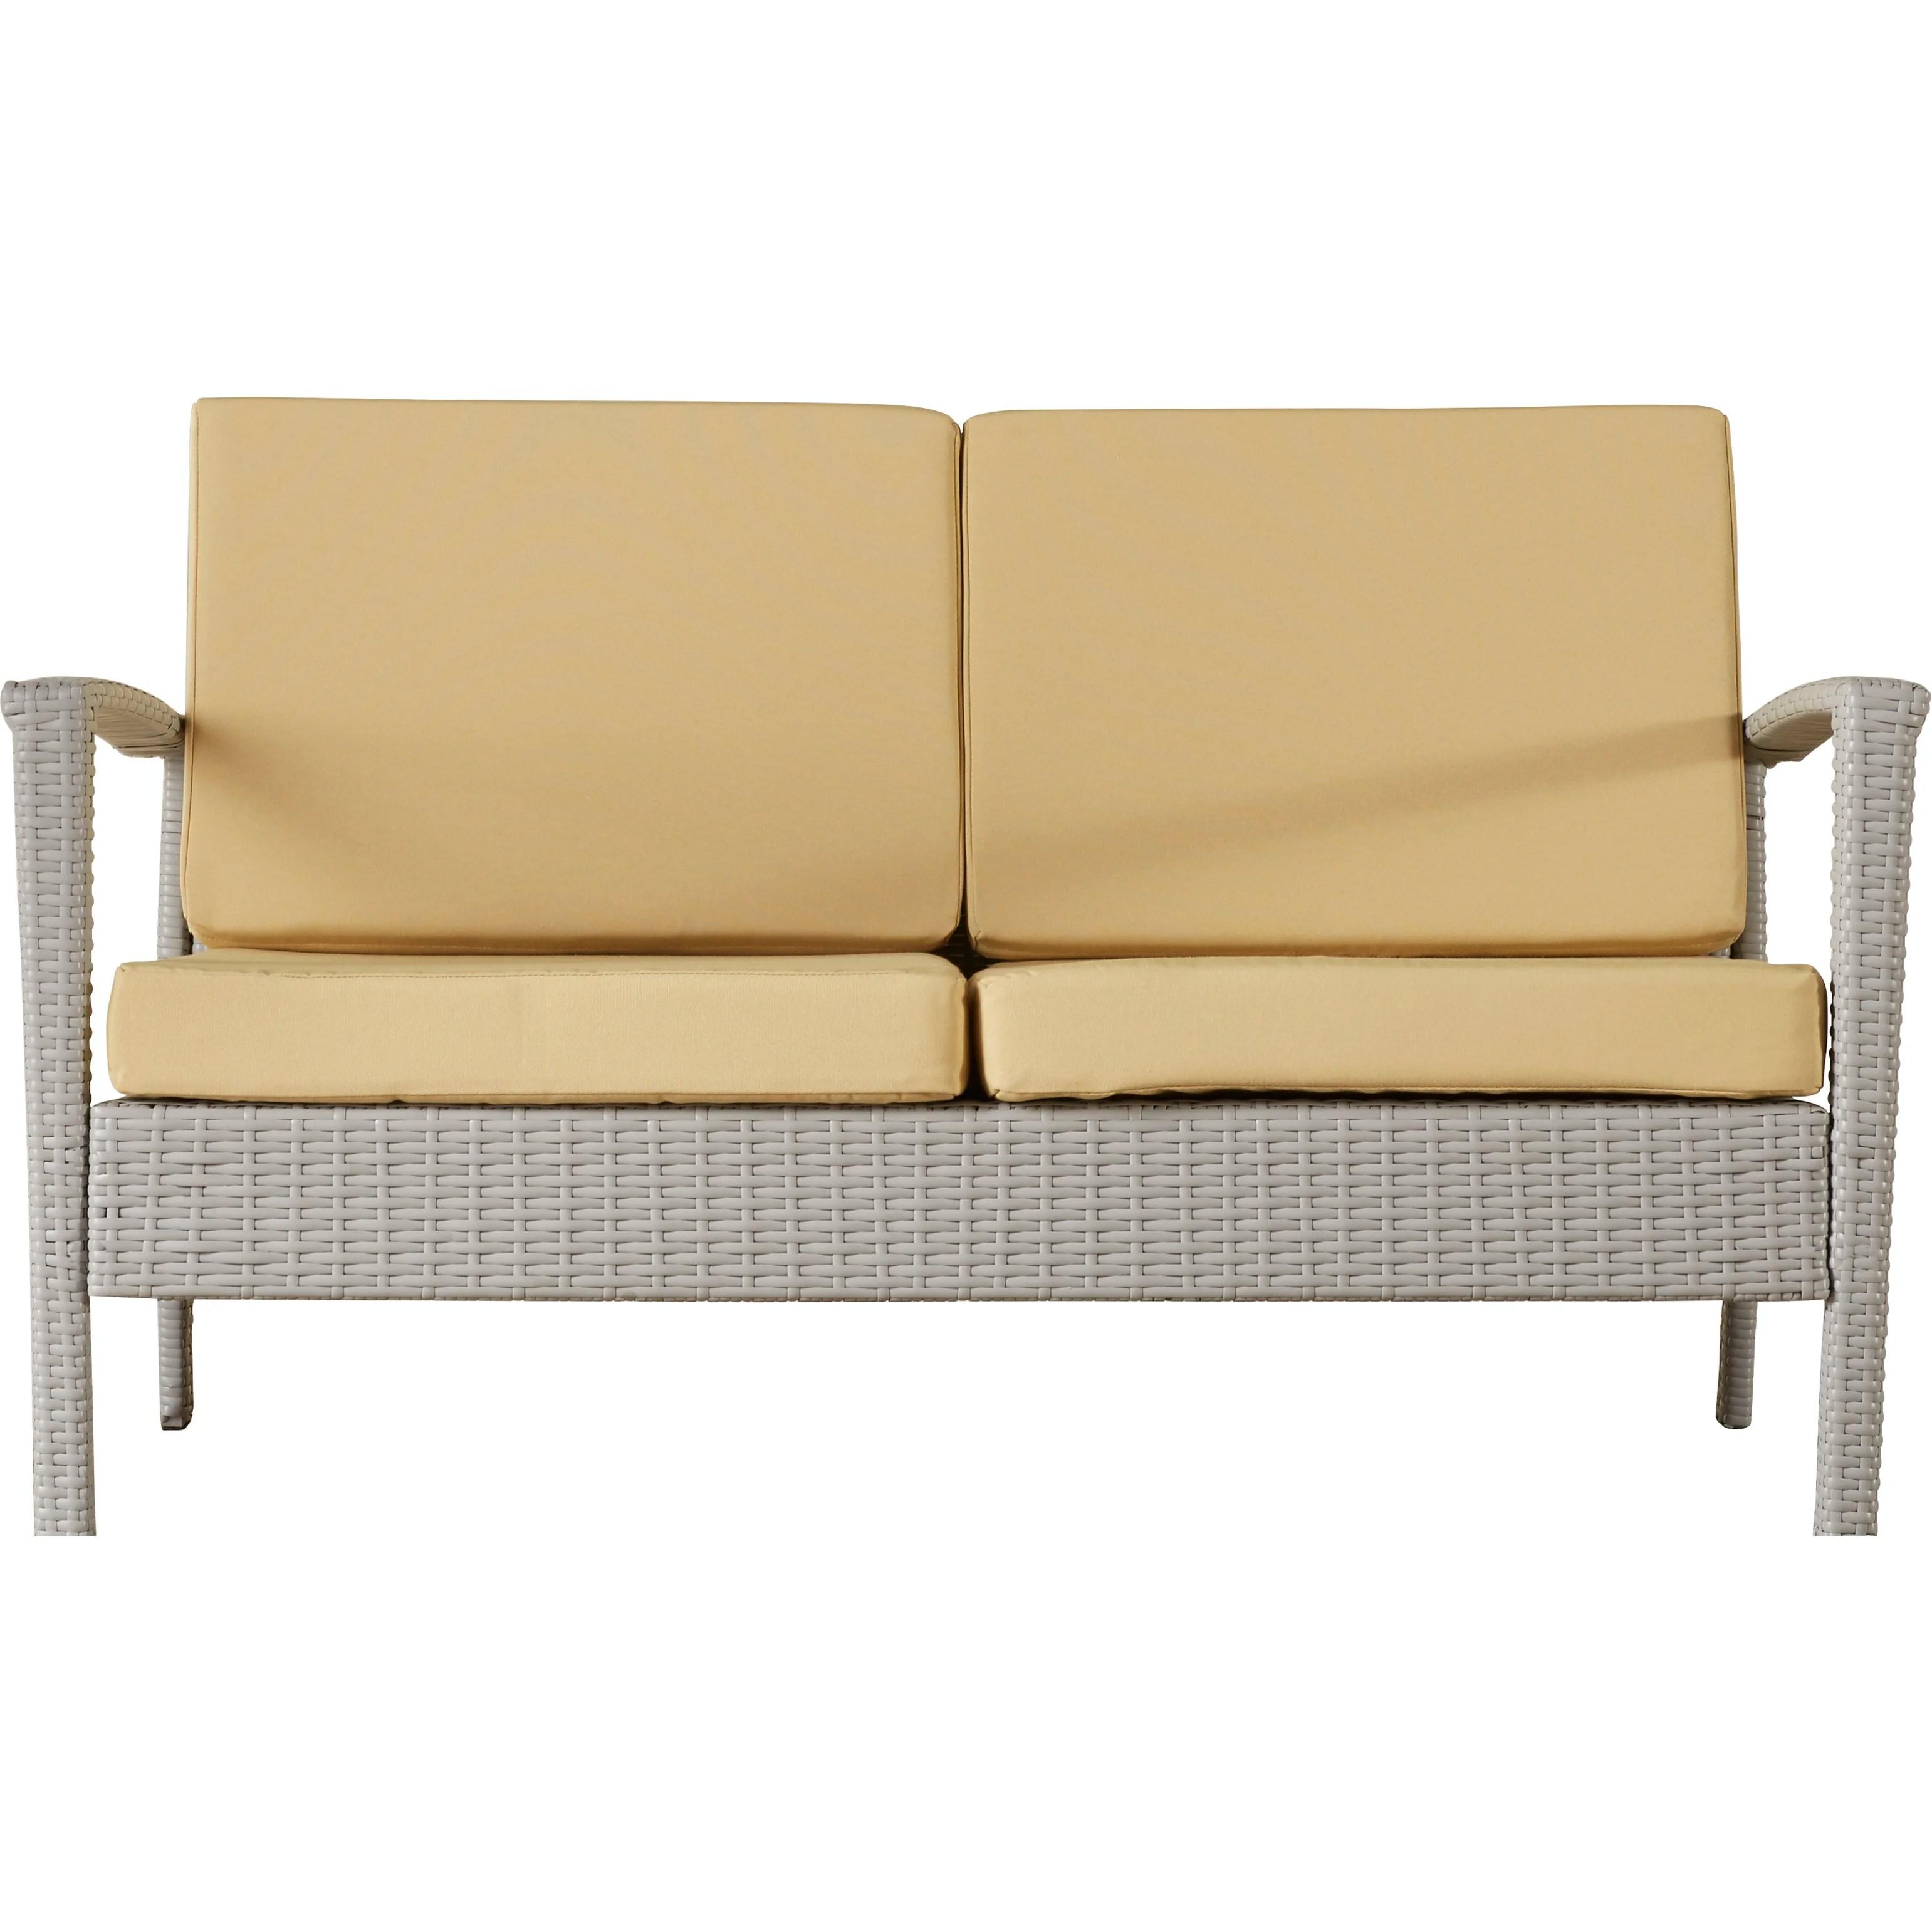 one piece patio chair cushions mat for carpet floors brayden studio piscataway 4 outdoor dining